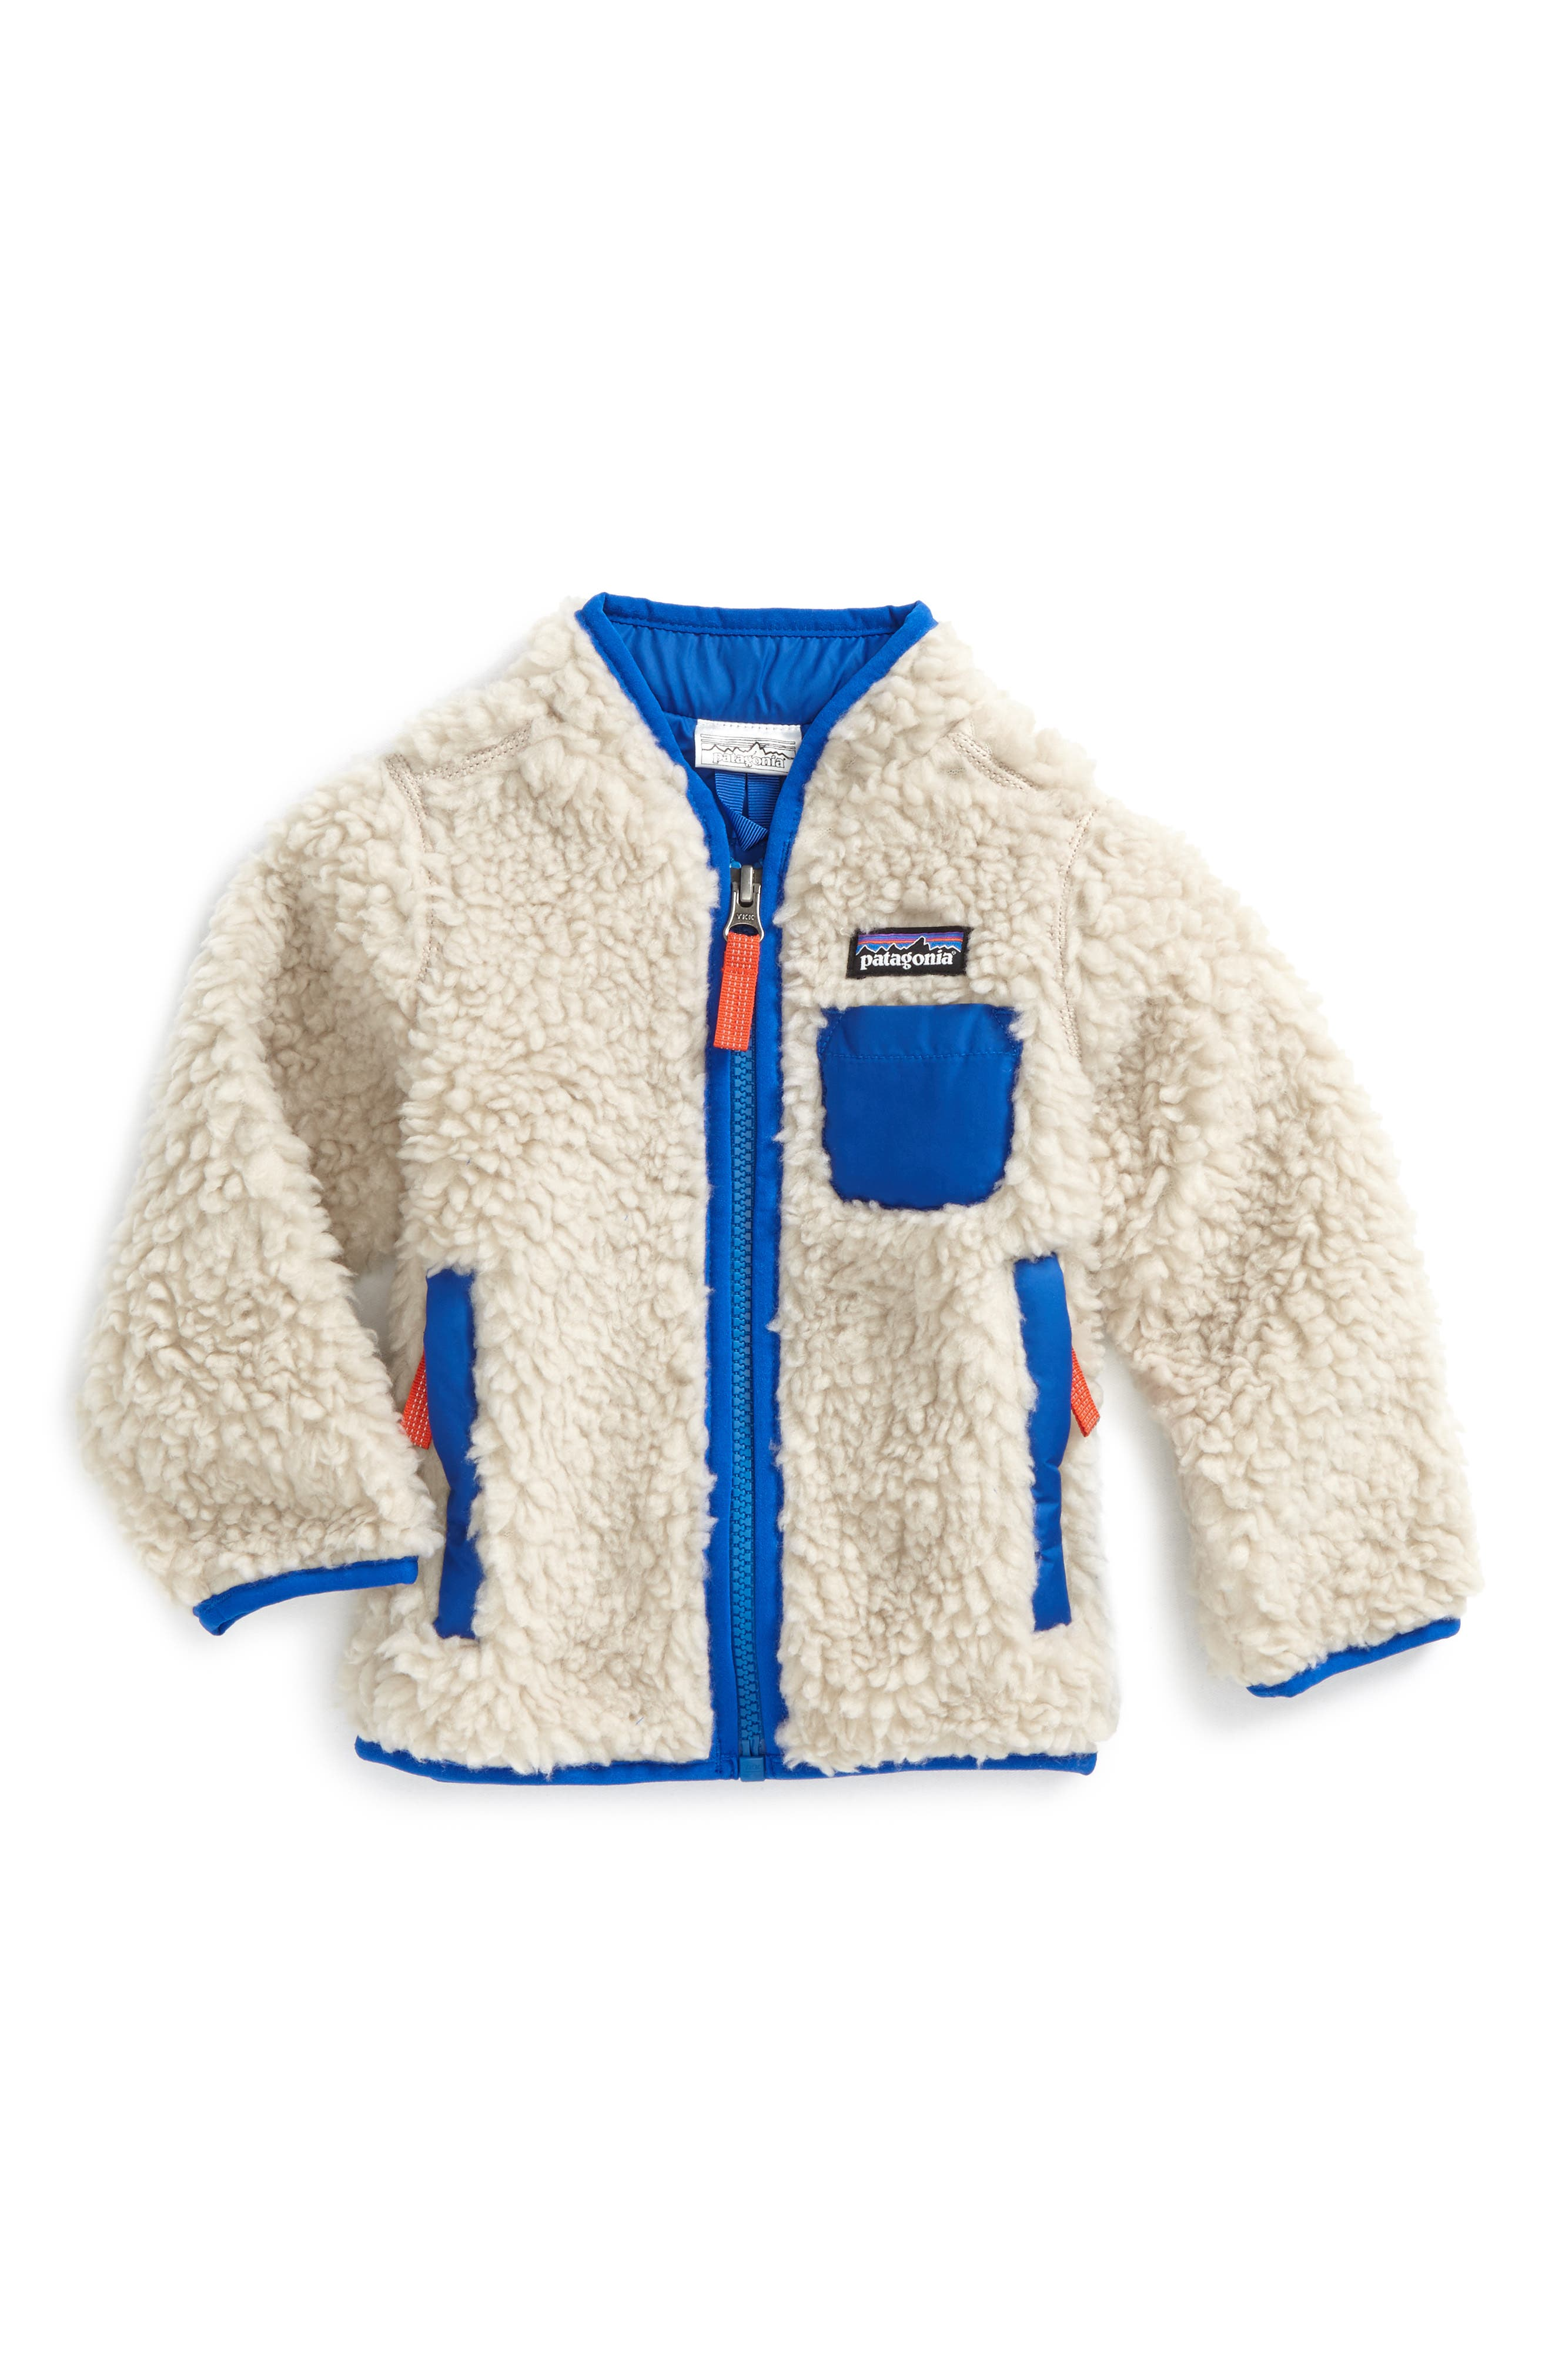 Retro-X Windproof Jacket,                         Main,                         color, Natural/ Viking Blue